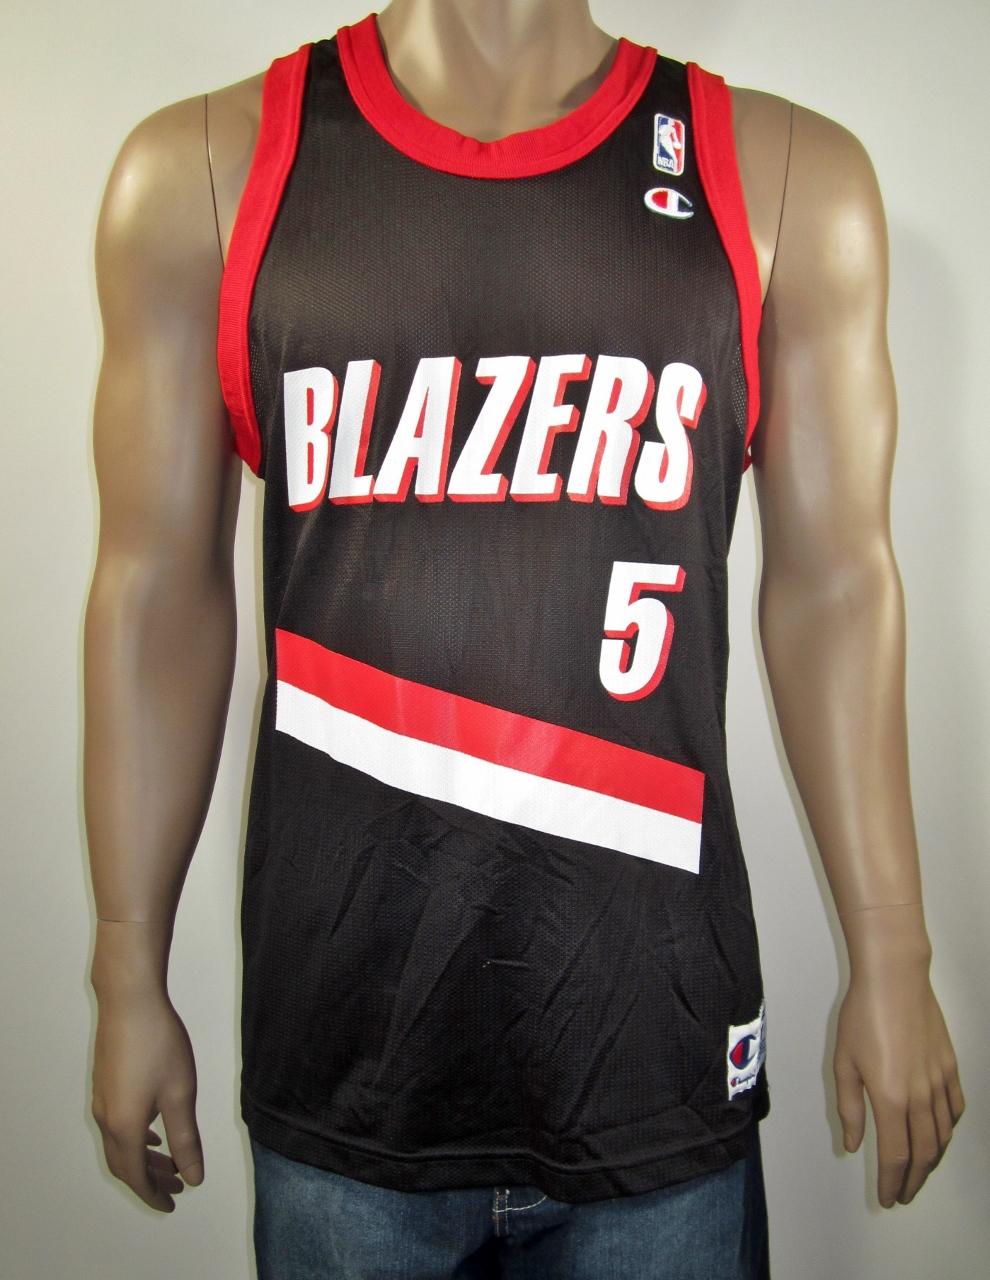 933206be967 Jermaine O Neal Portland Trail Blazers Champion Jersey 44 NWT on ...